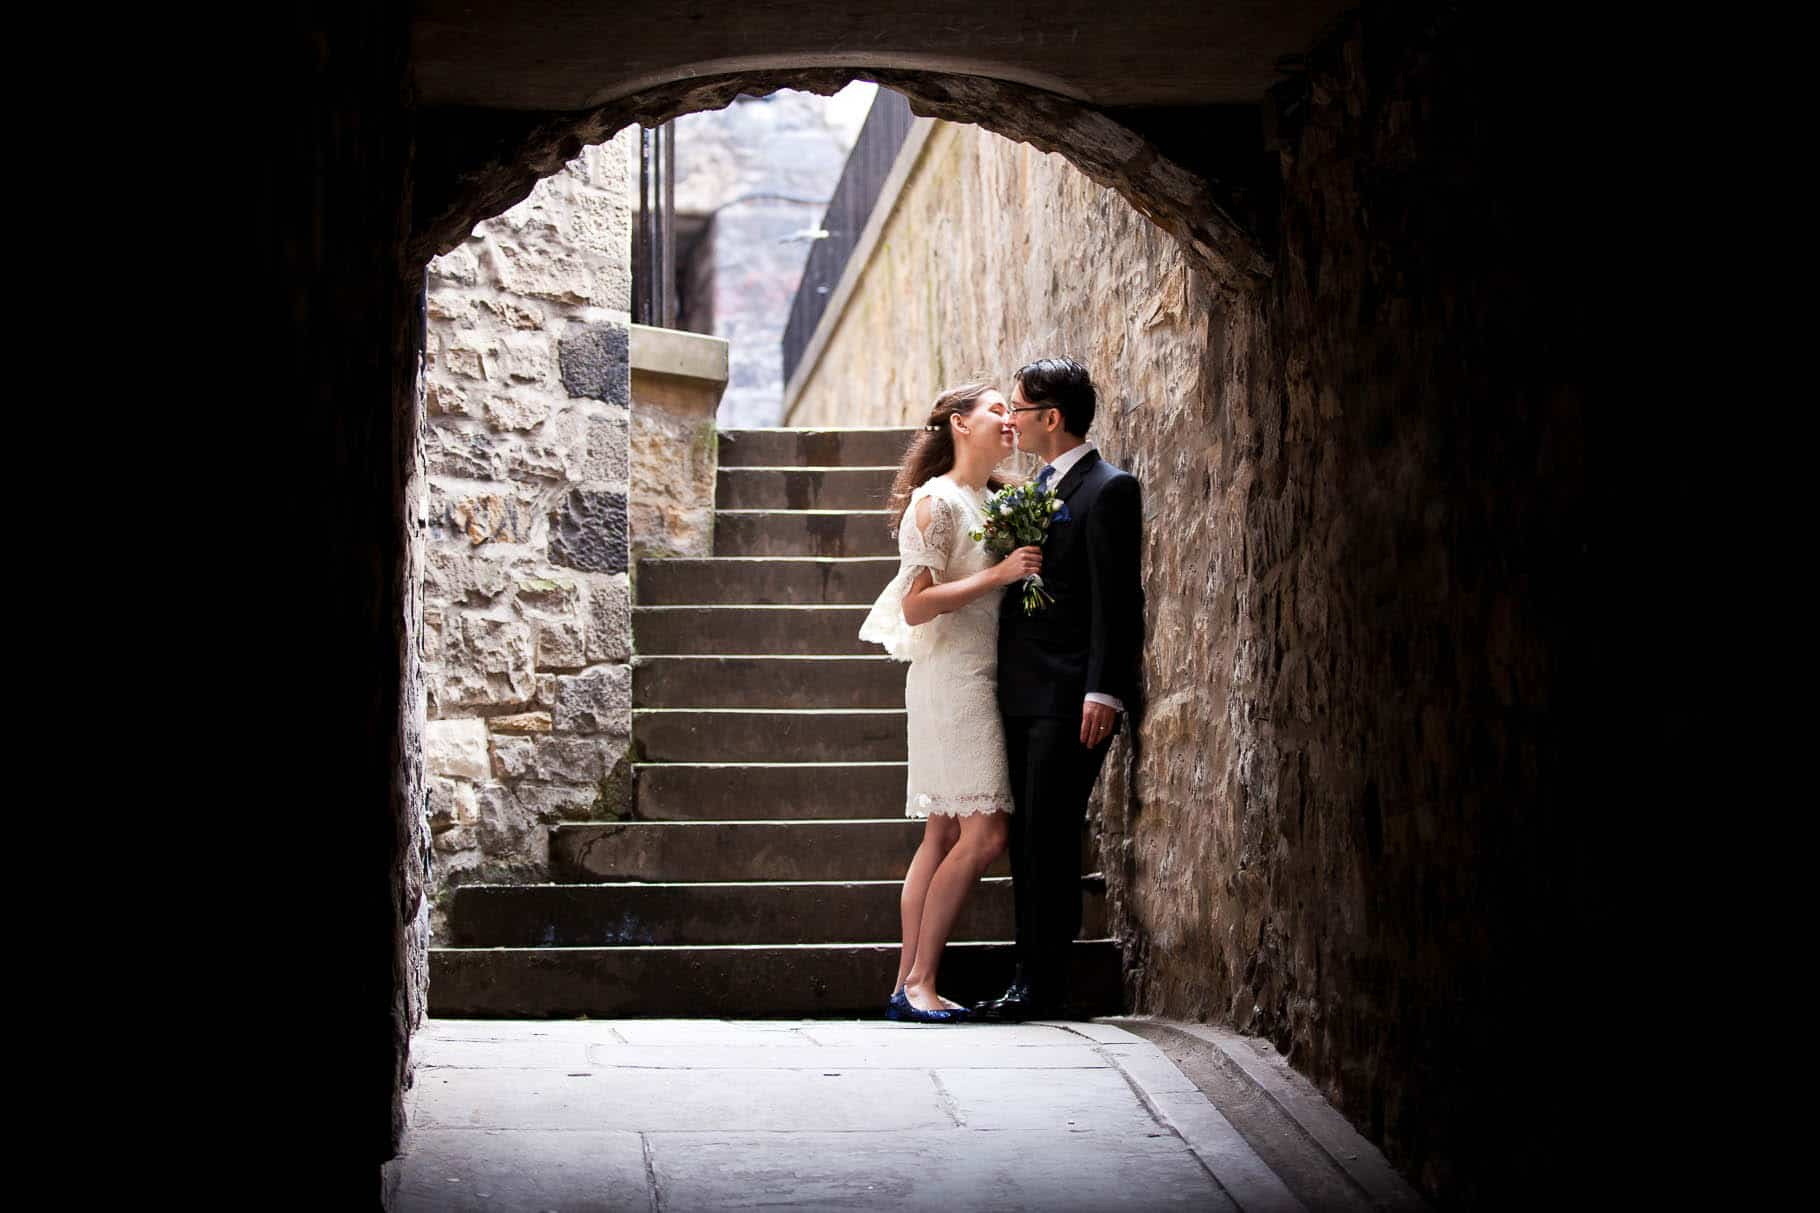 Lush Wedding Photography - Official Site Wedding photography central scotland